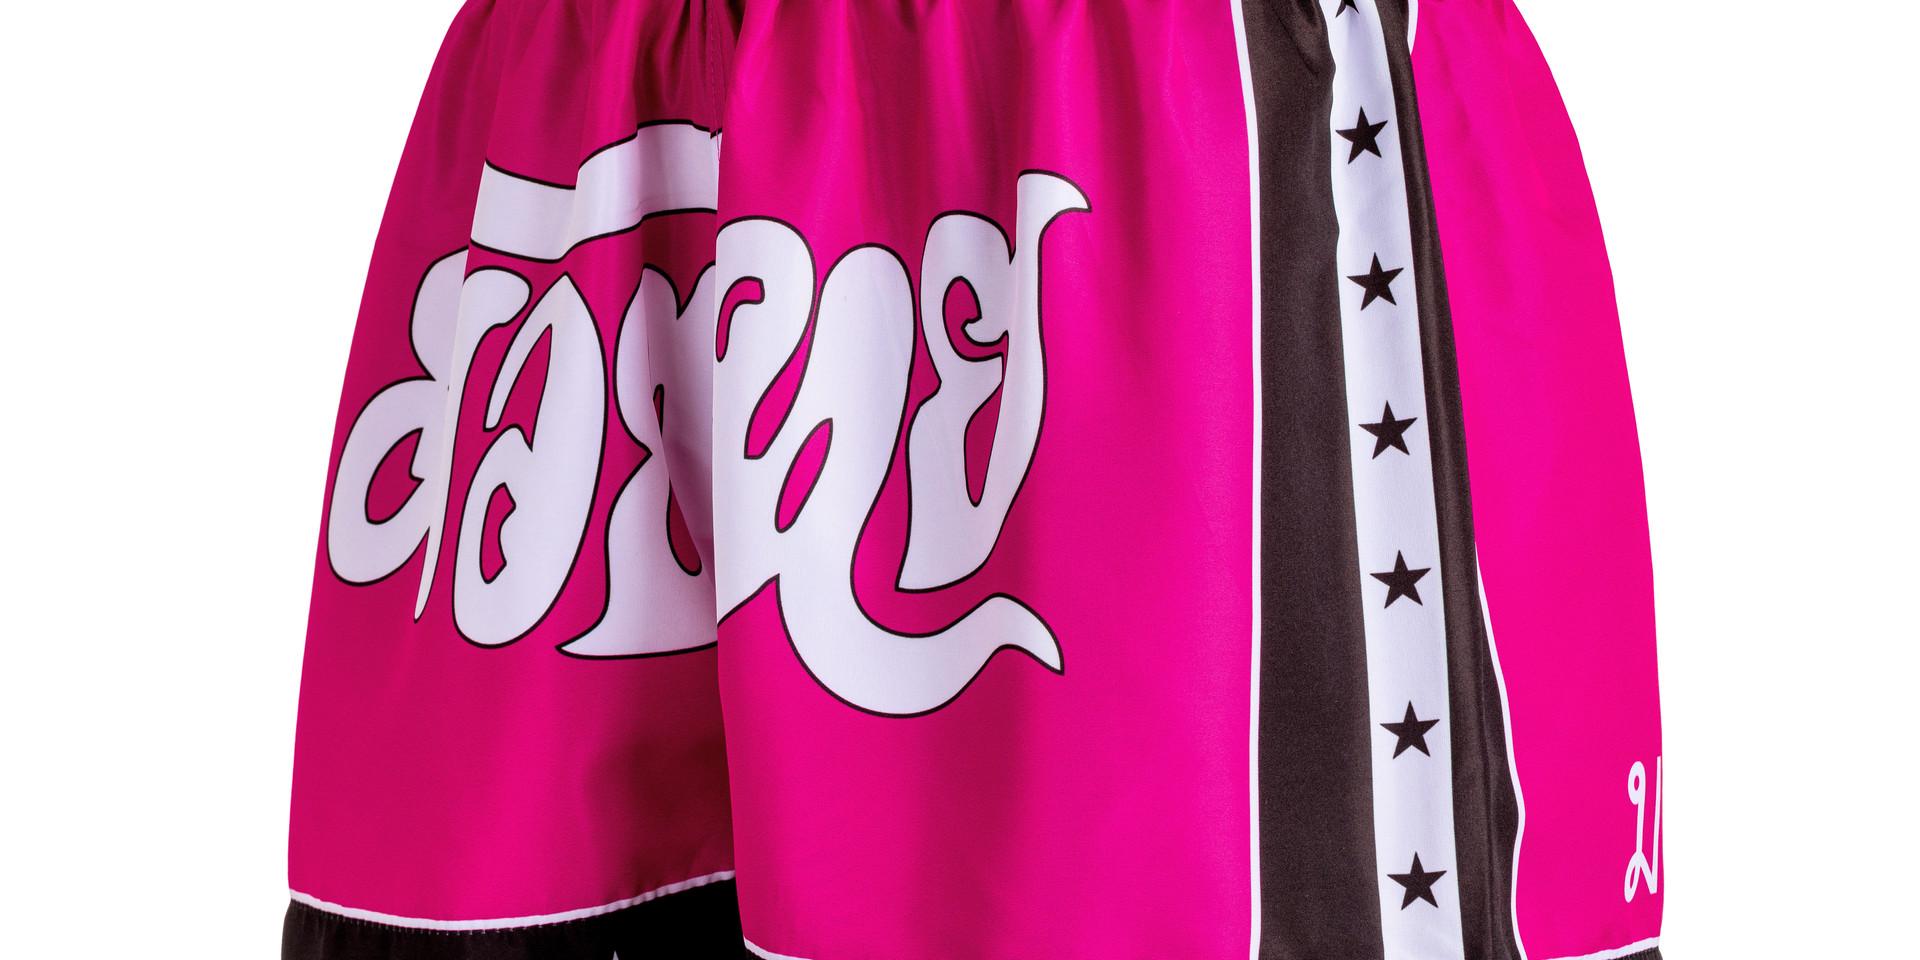 Shorts Fheras Estrela 2 Rosa/Preto